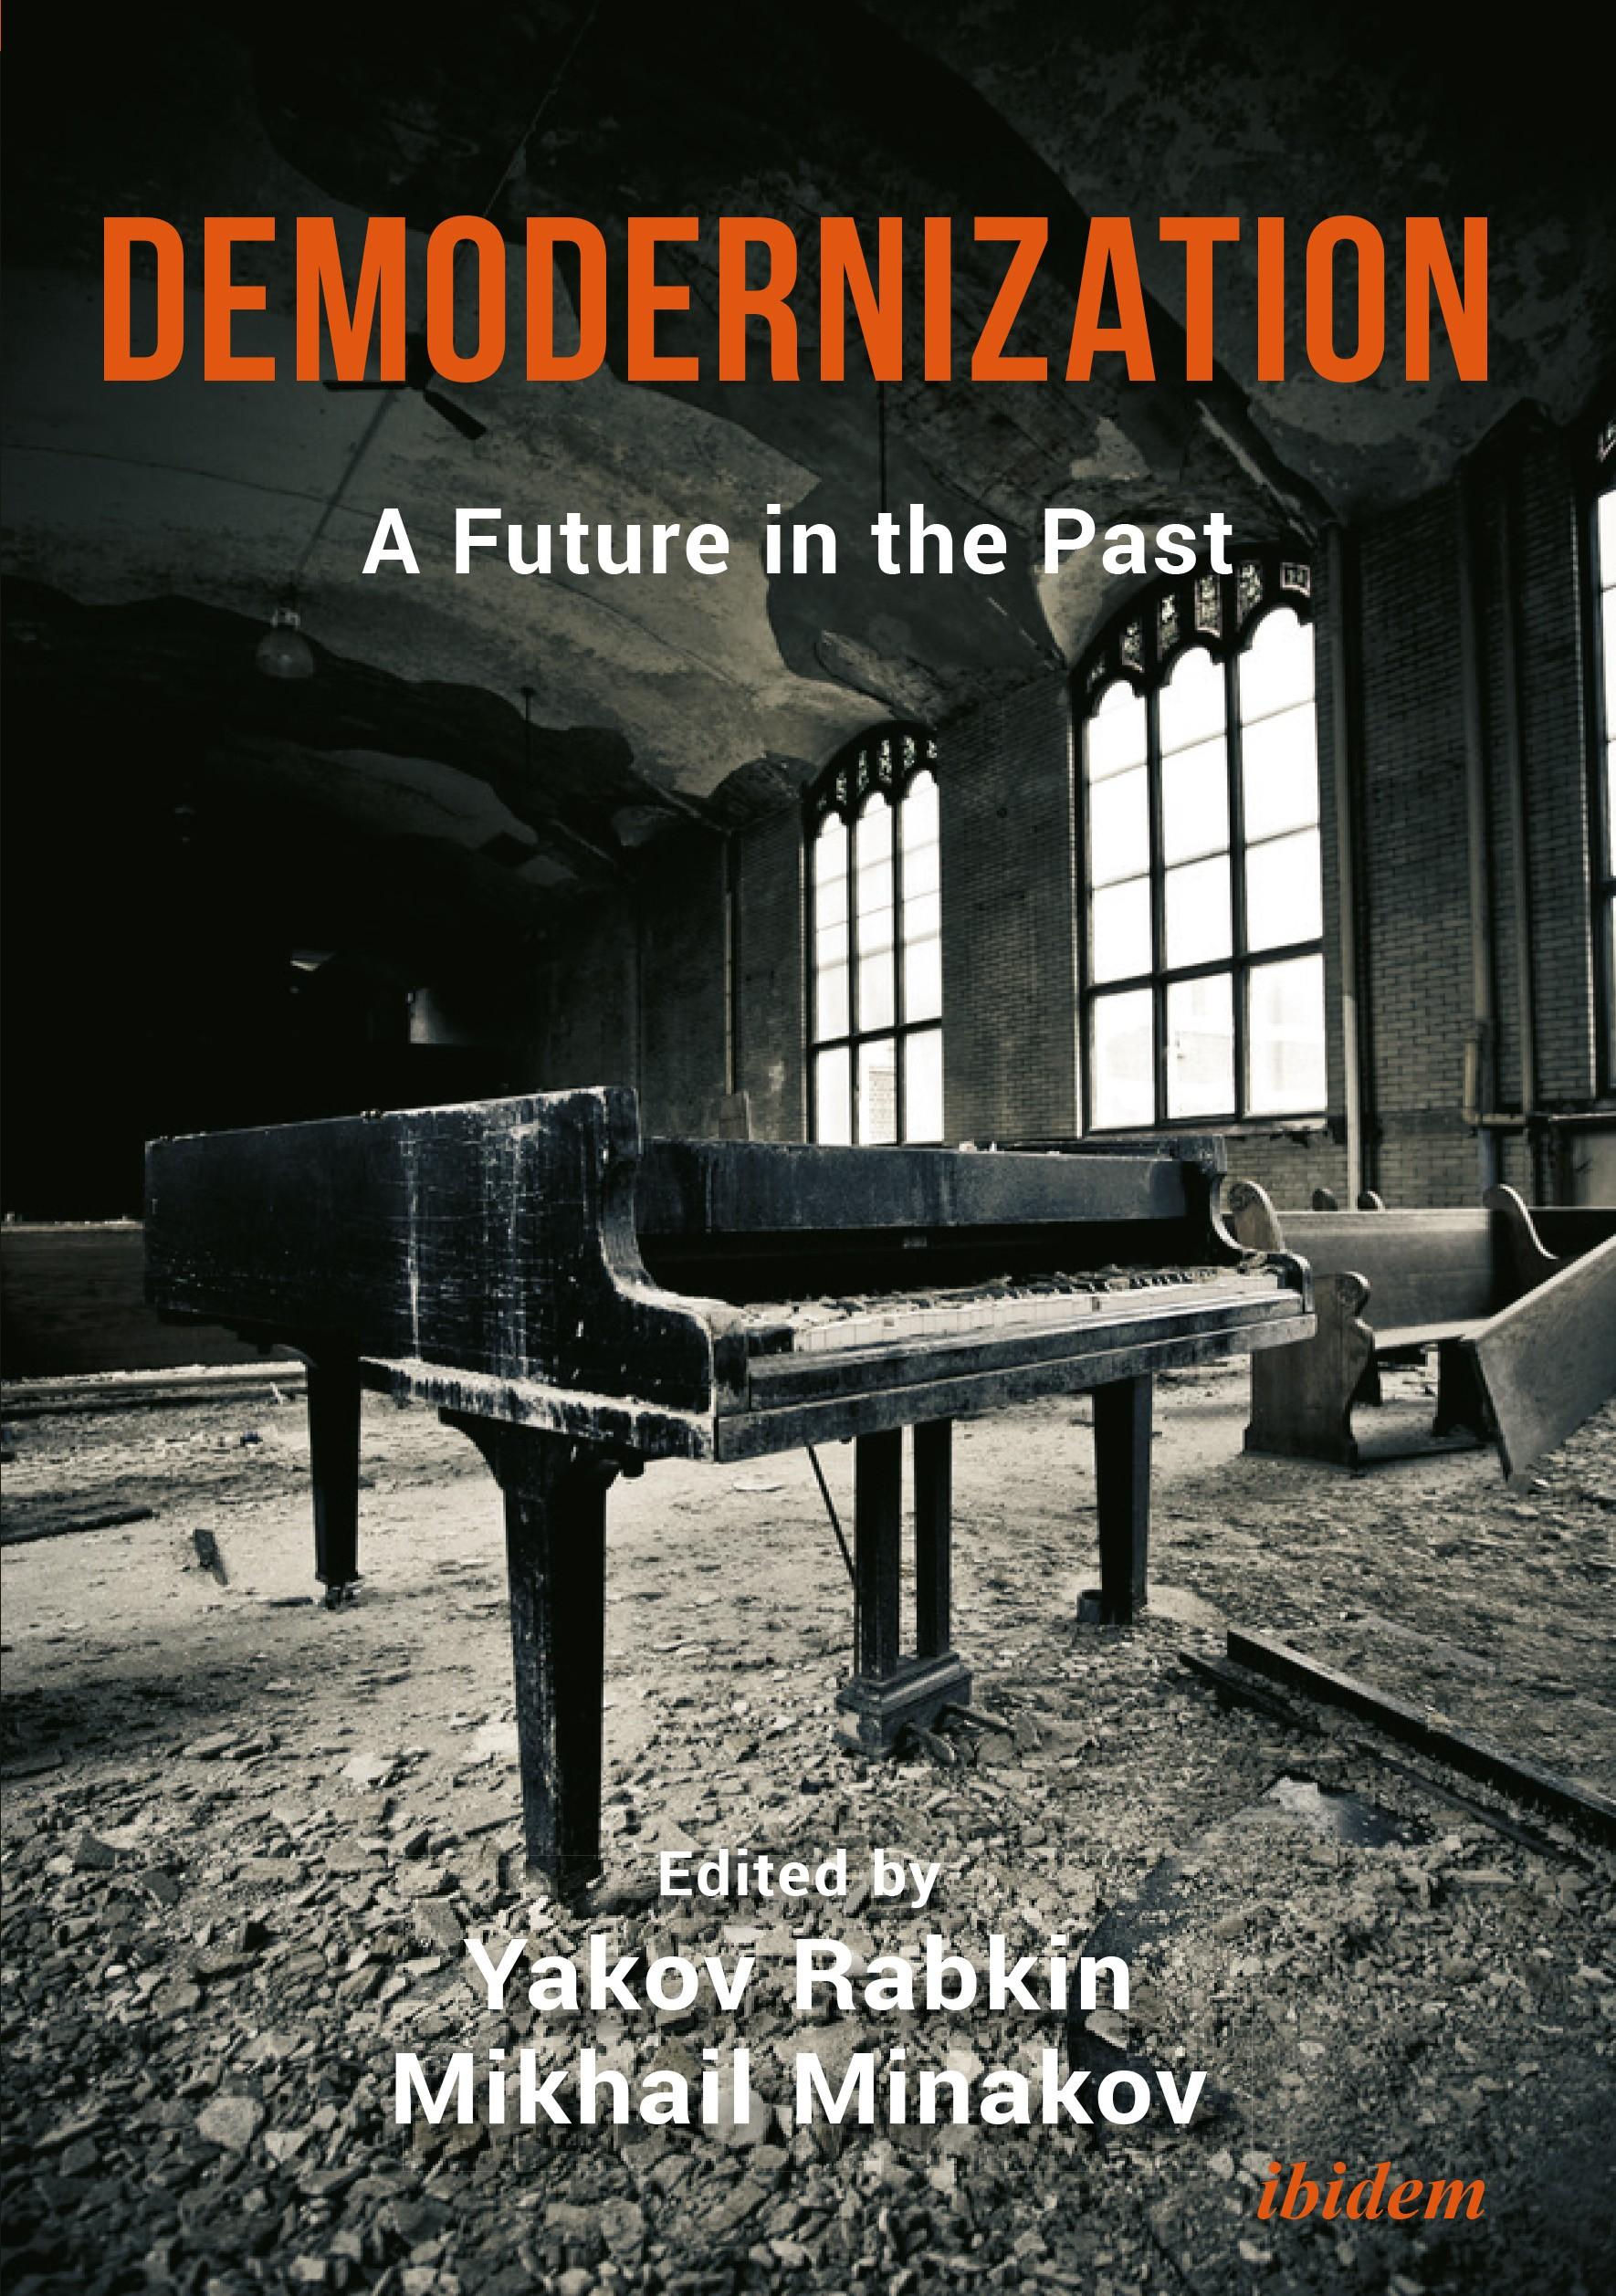 Demodernization